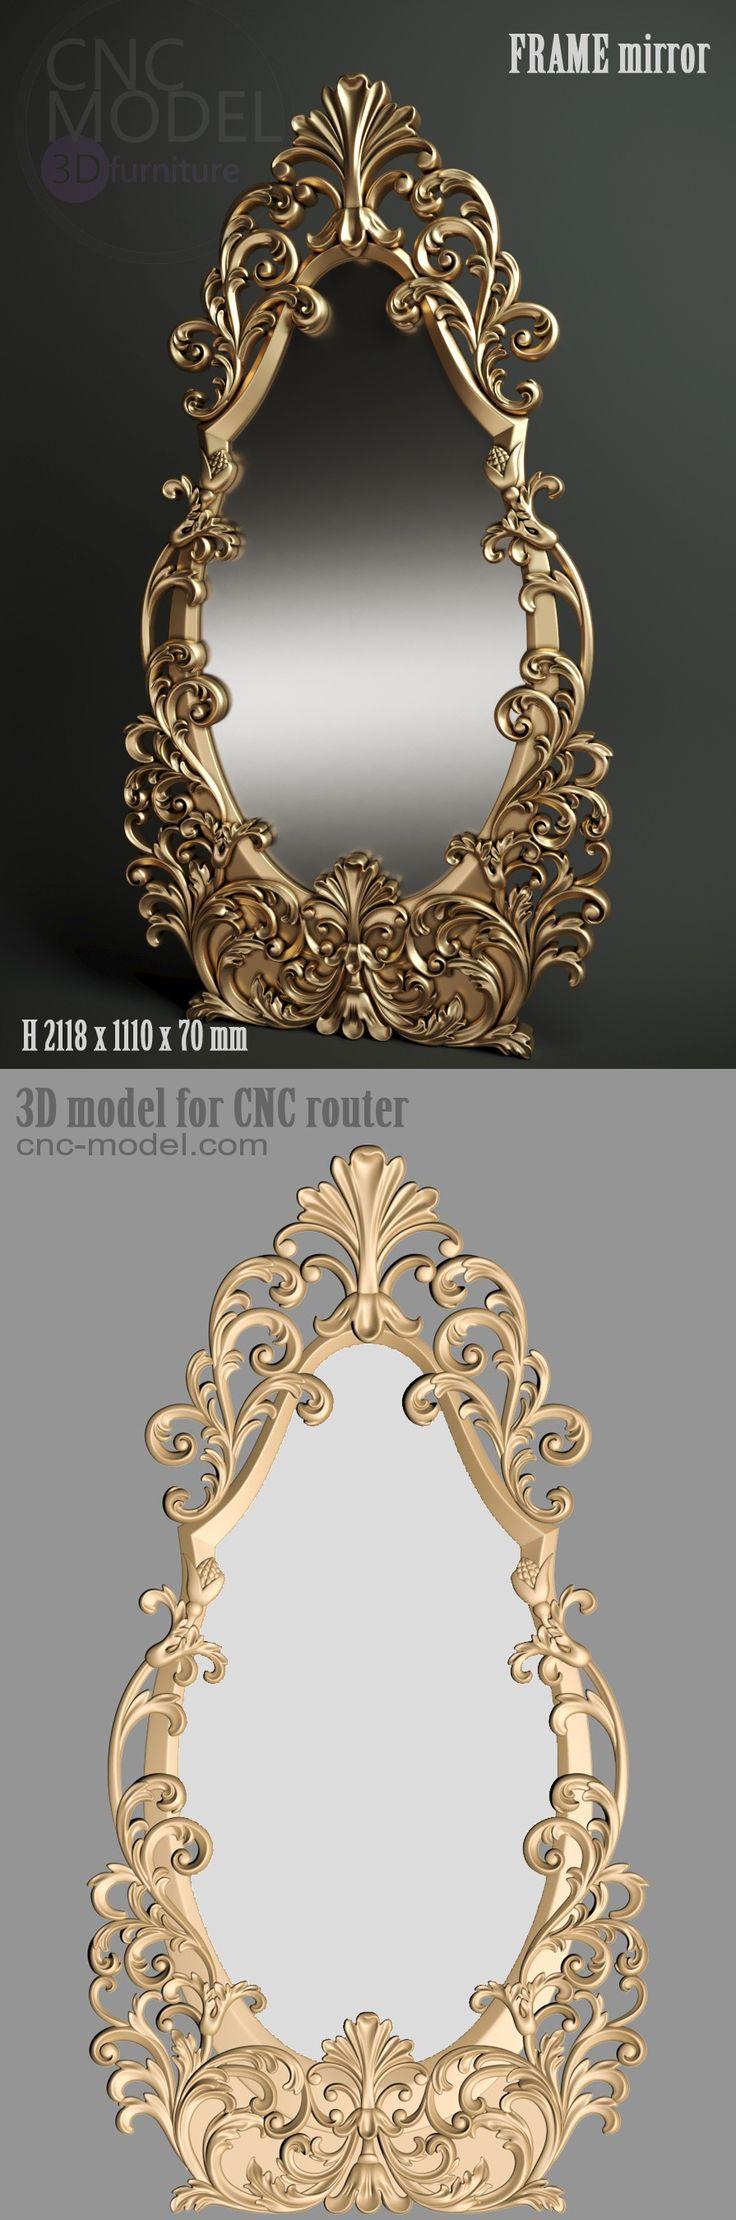 A186  FRAME mirror cnc-model.com 3D model for cnc router 3D furniture – 3D TECHNOLOGY